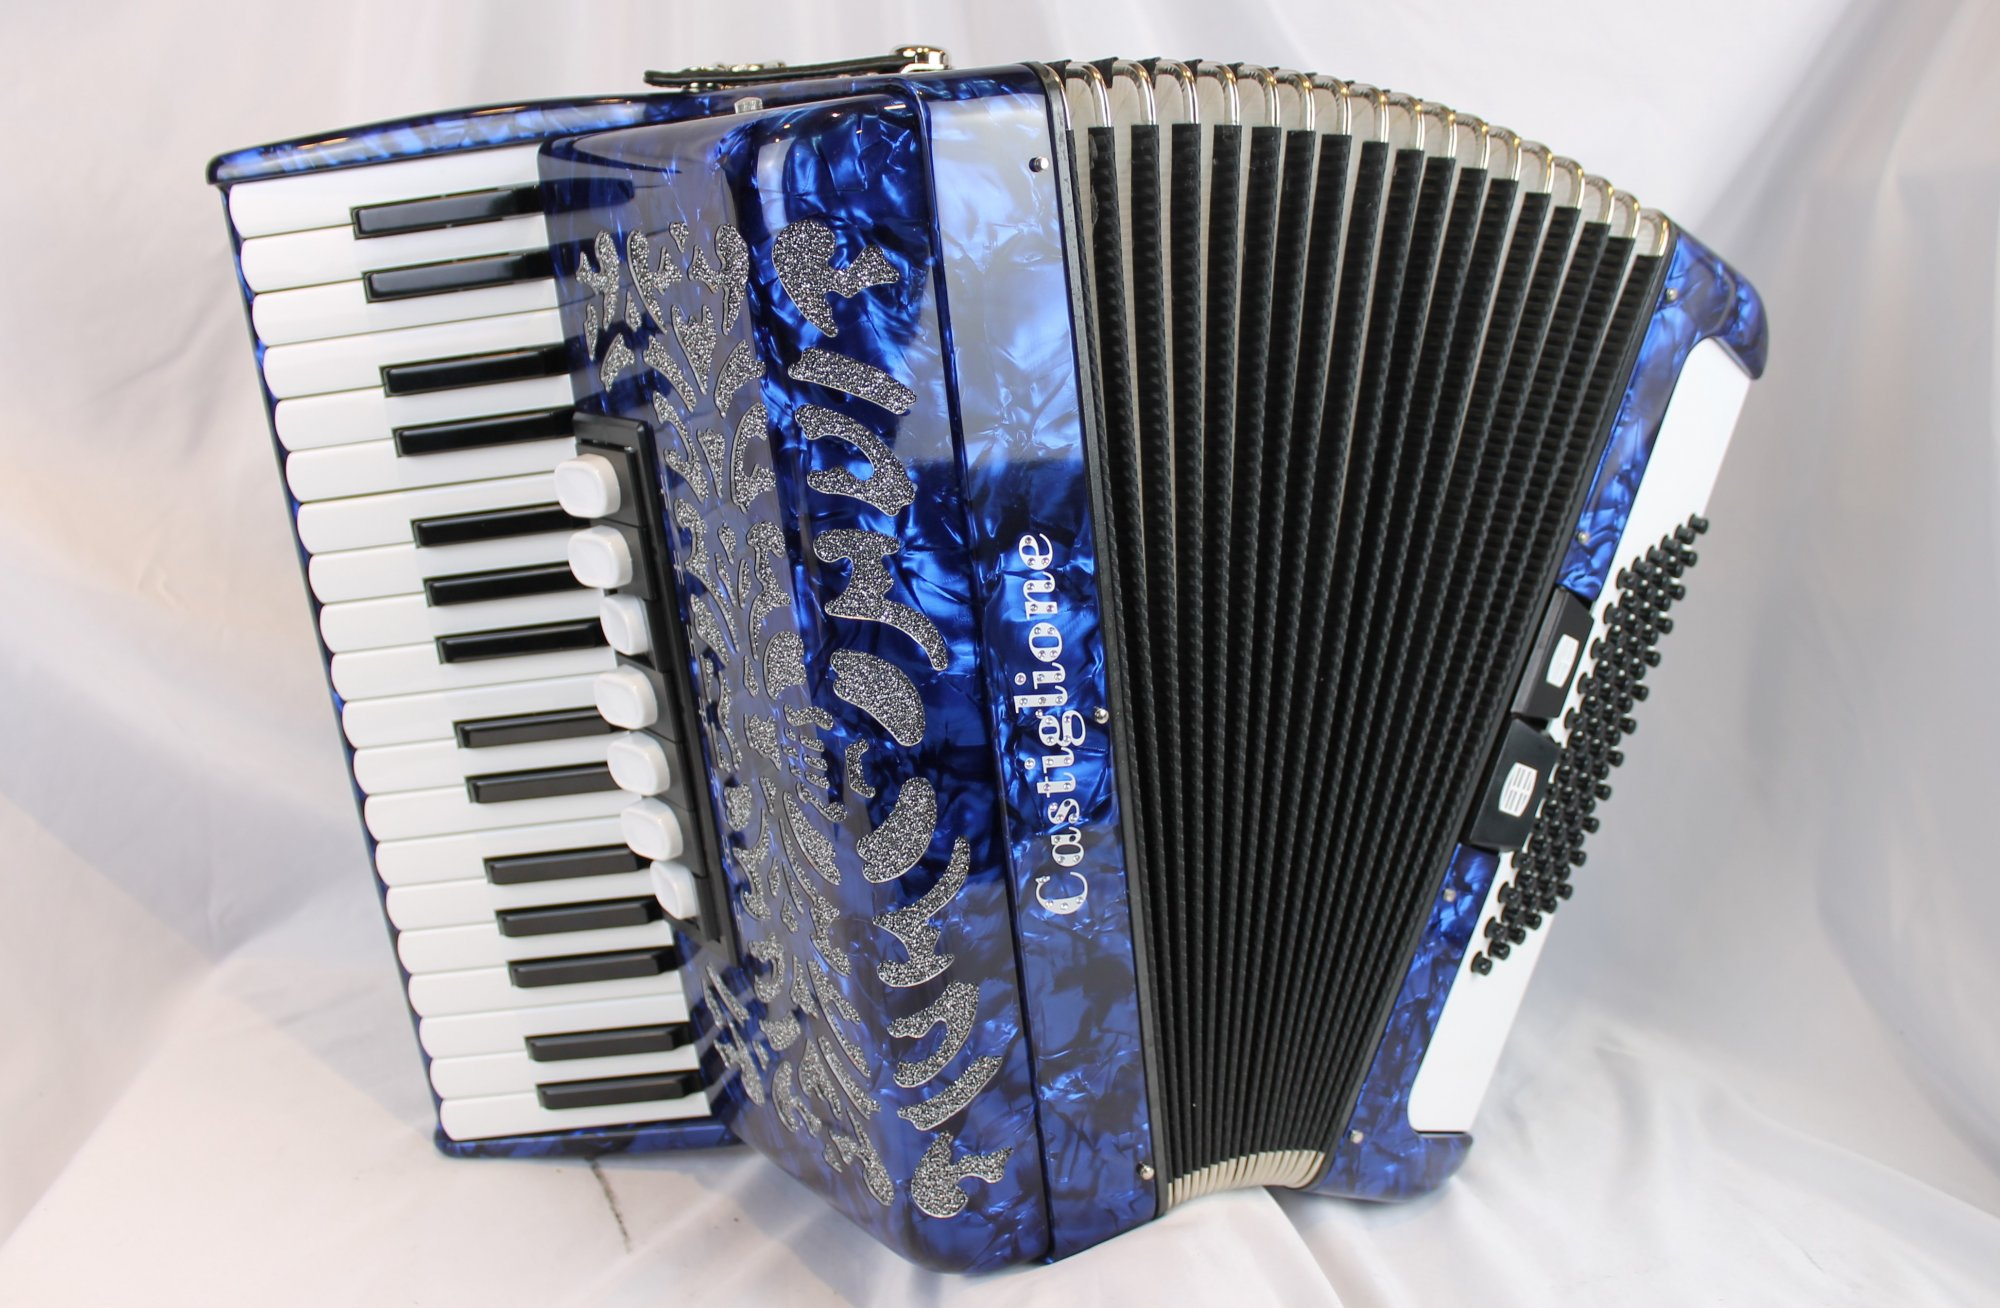 NEW Blue Pearl Castiglione Piano Accordion LMM 34 72 Compare to Weltmeister Achat